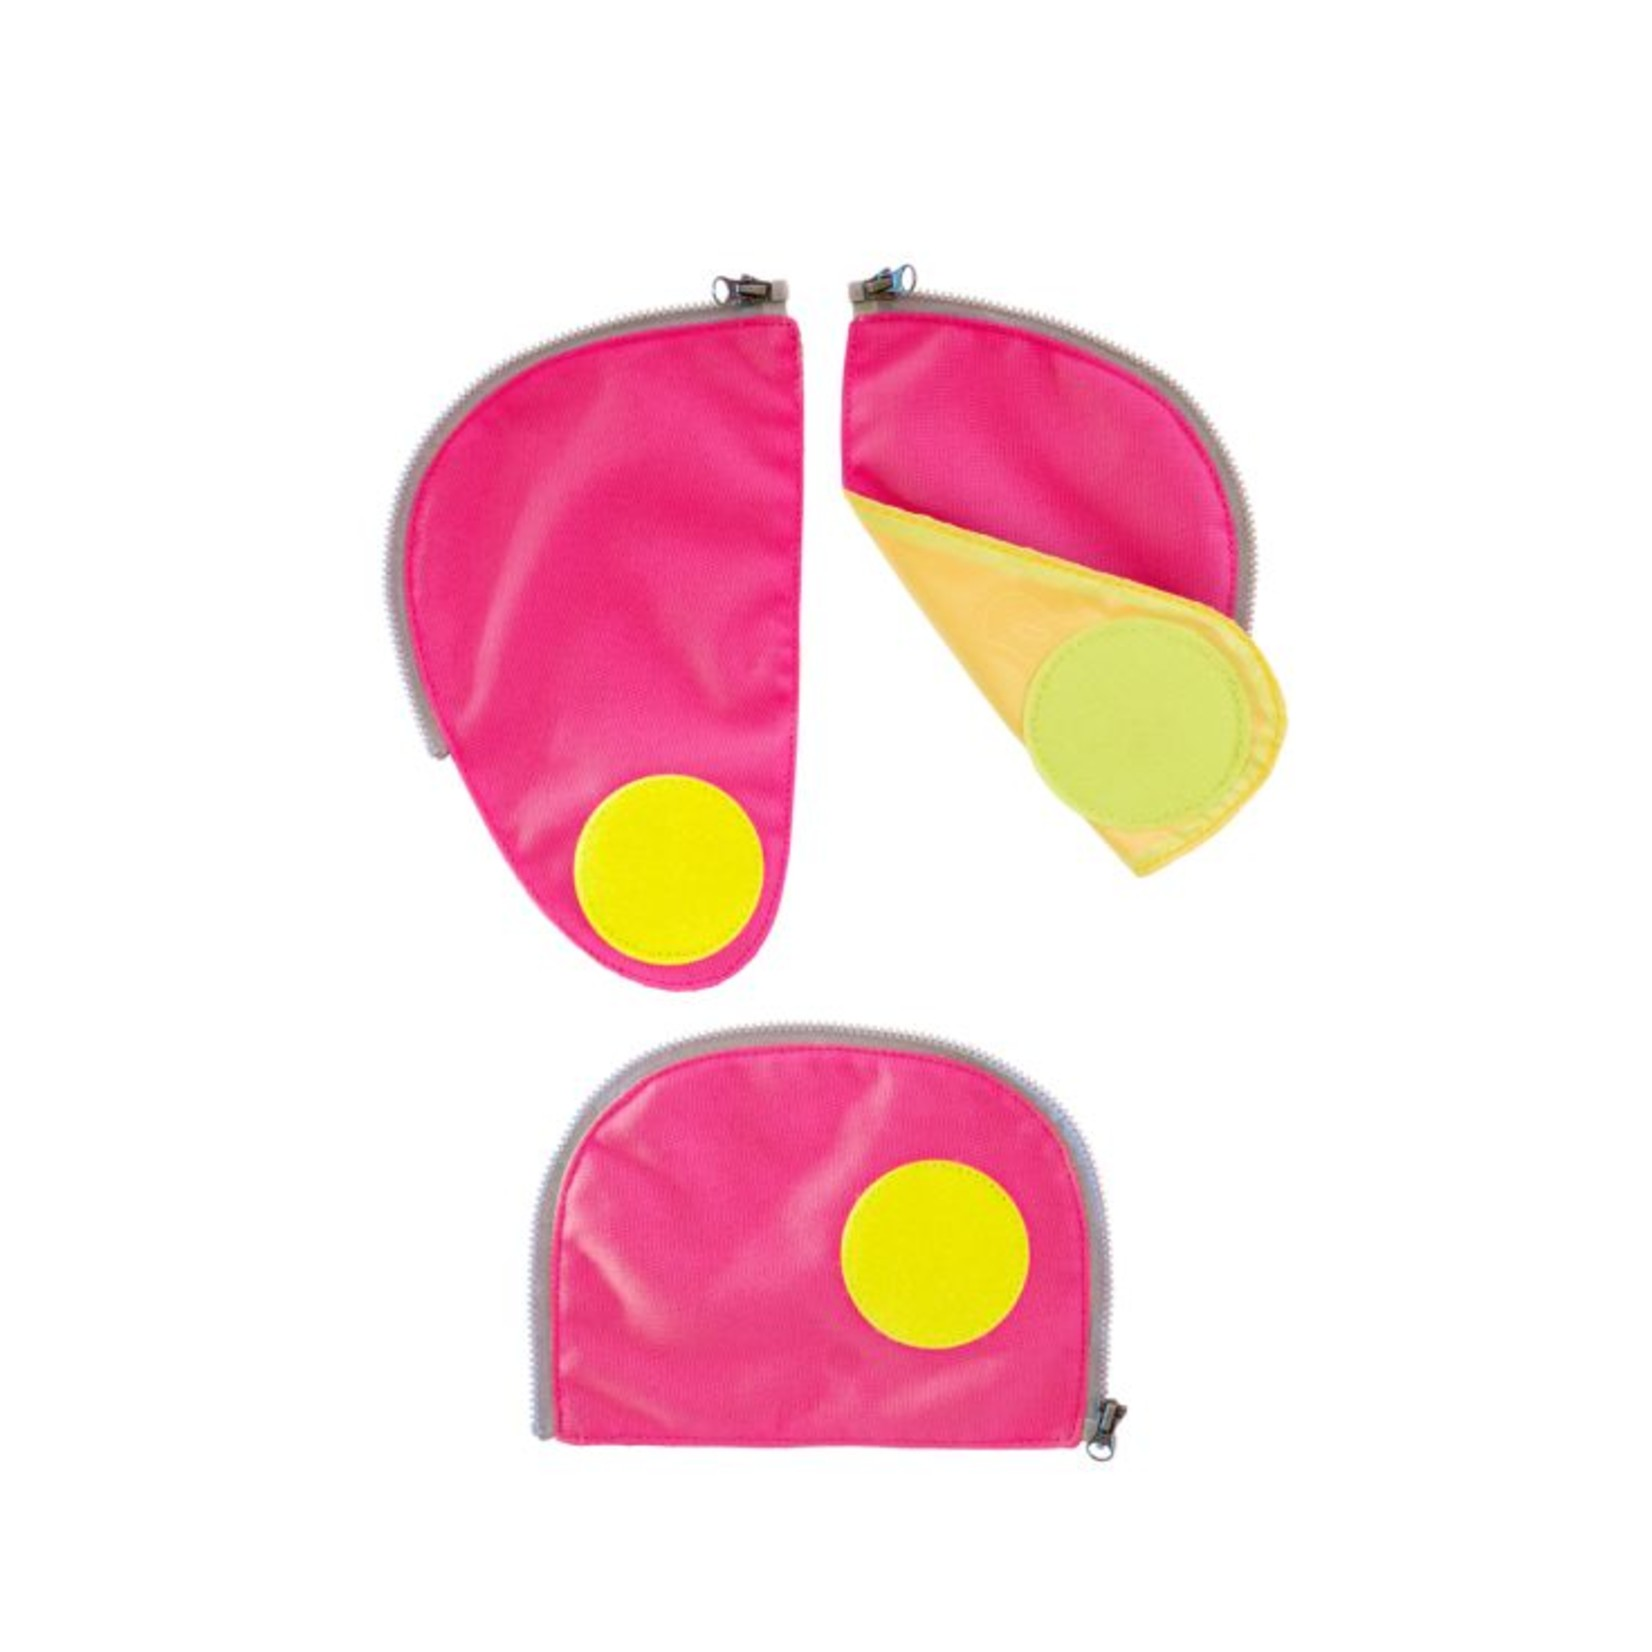 ERGOBAG ERGOBAG CUBO Sicherheitsset pink